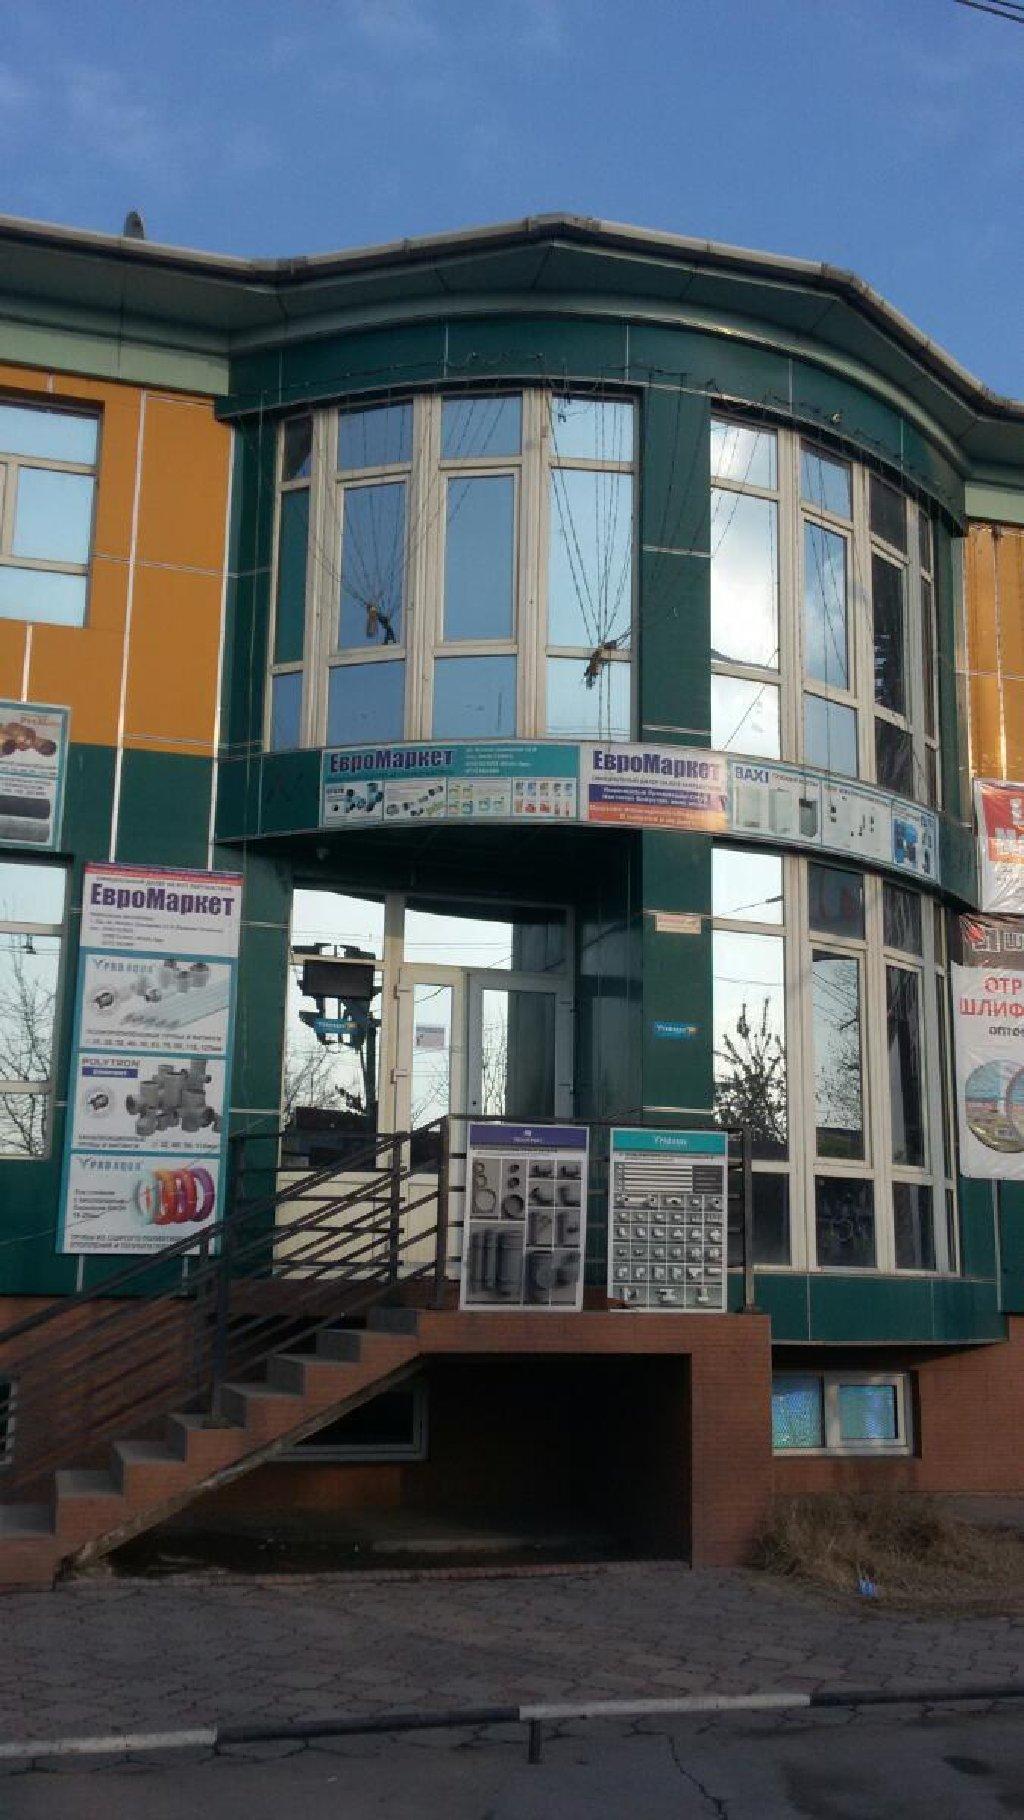 Сдается помещения 50 кв.м г.Ош ул. А.Шакирова ориентир ТЦ. Ош Таатан